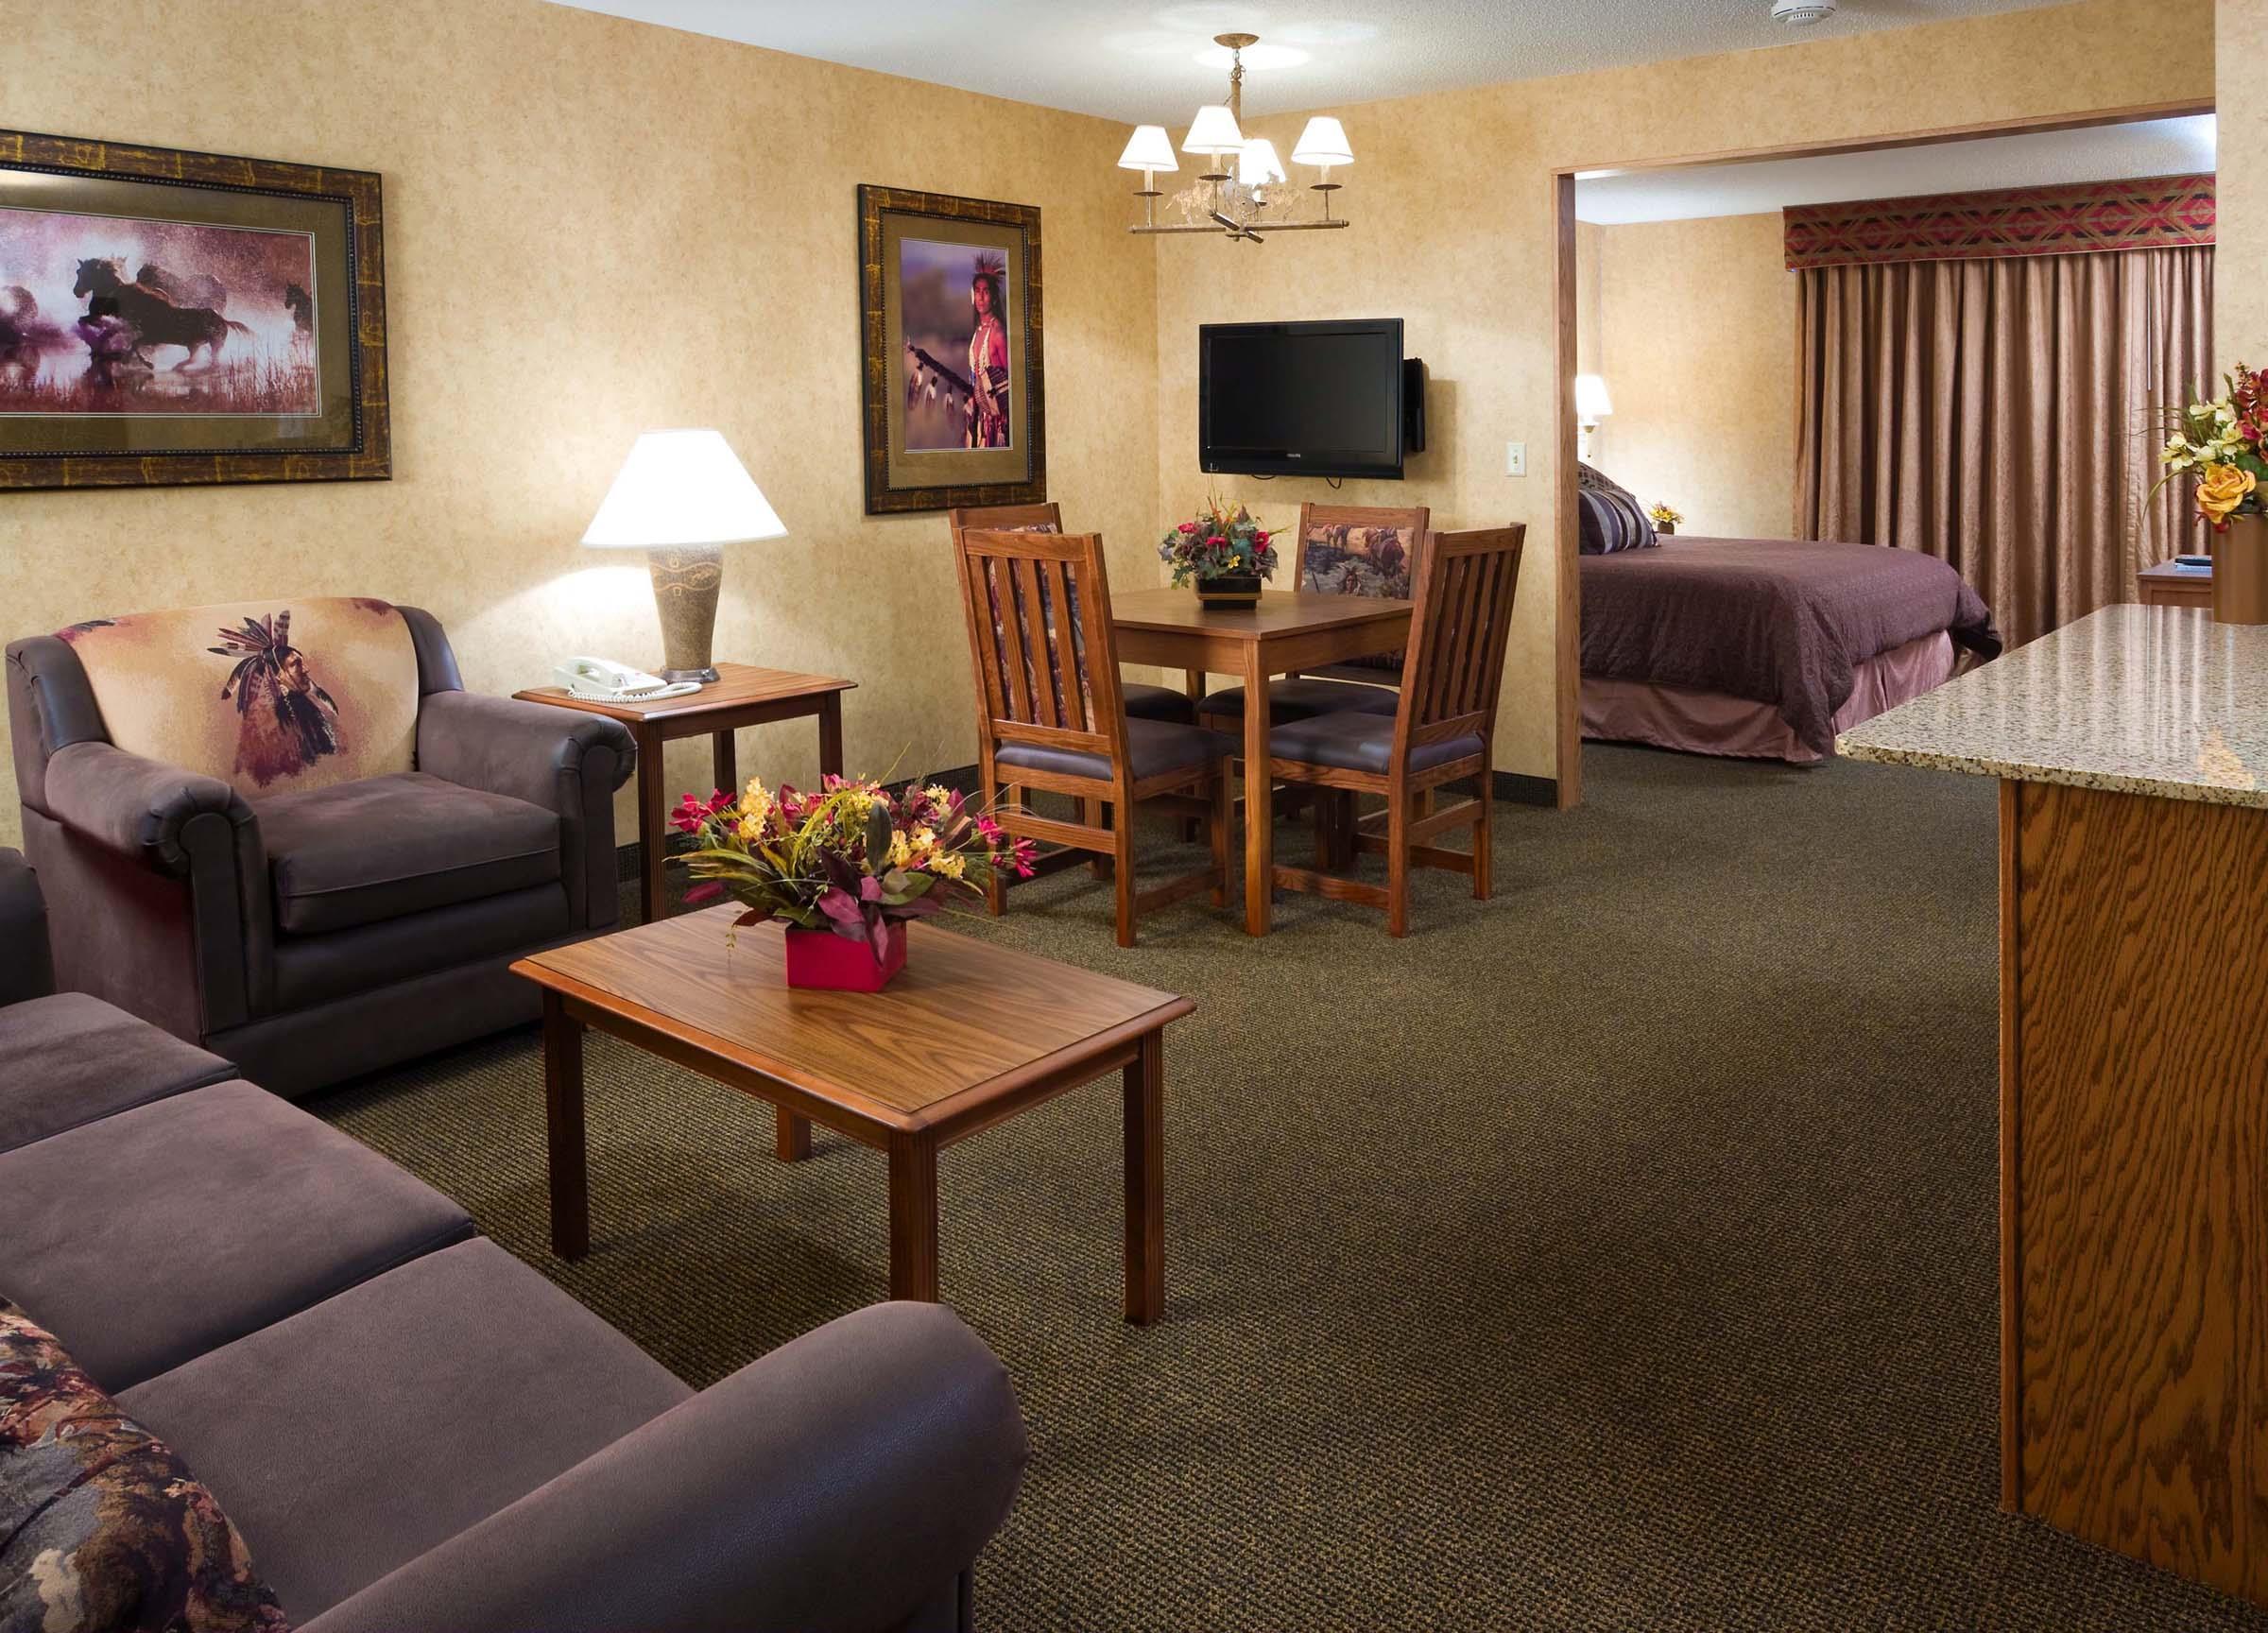 Best Western Ramkota Hotel image 16